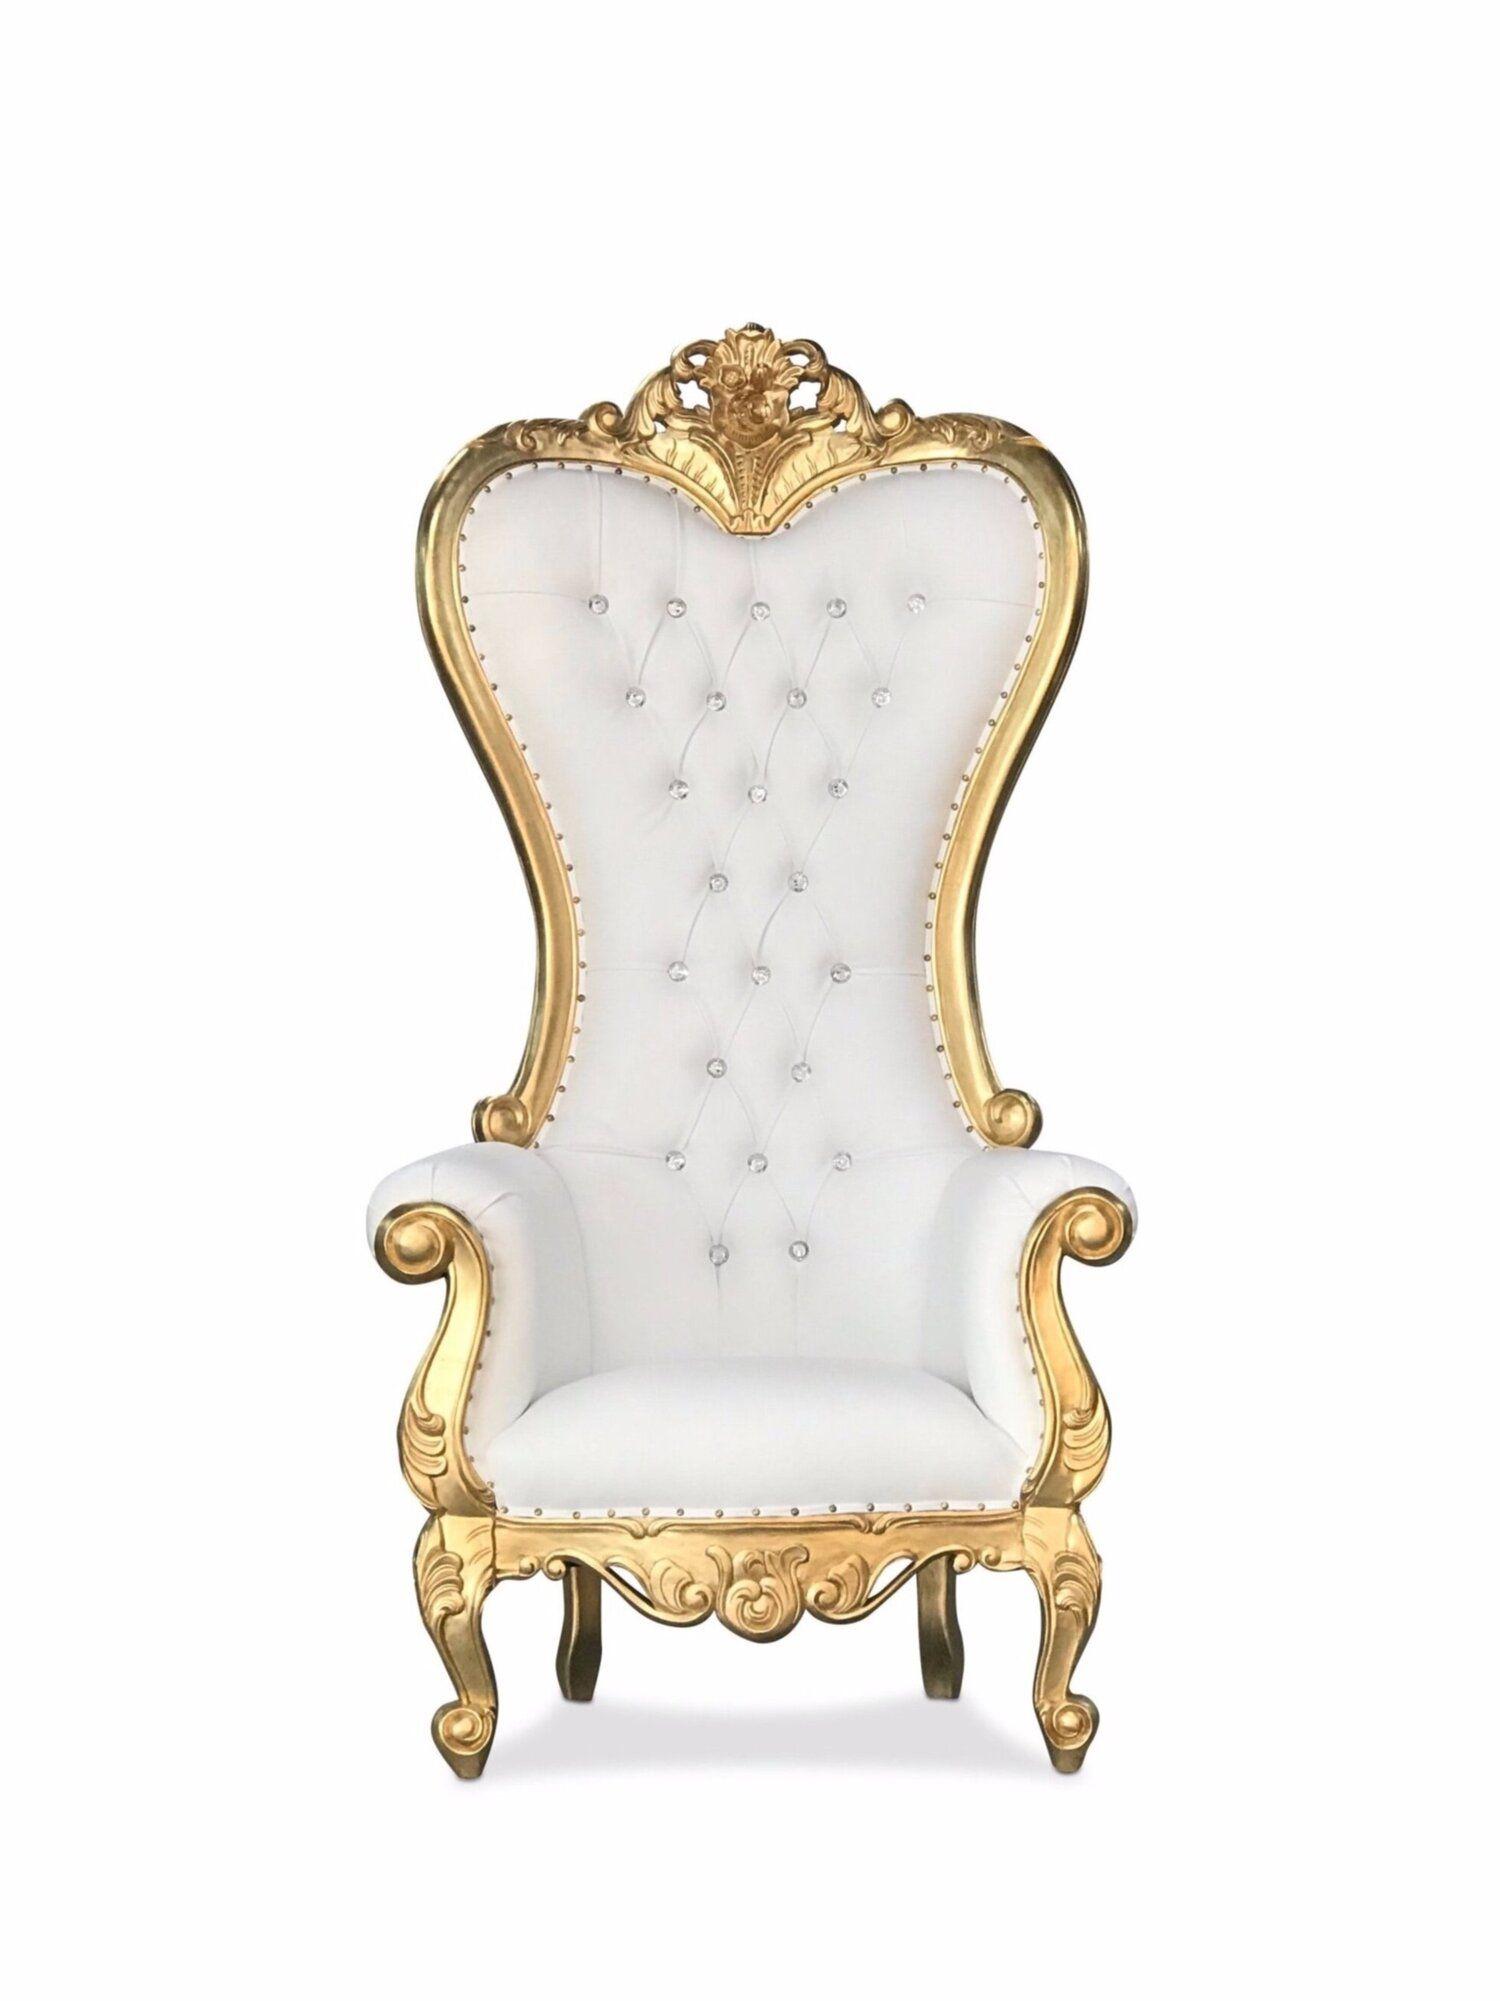 72 melina throne chairs goldwhite chiseled